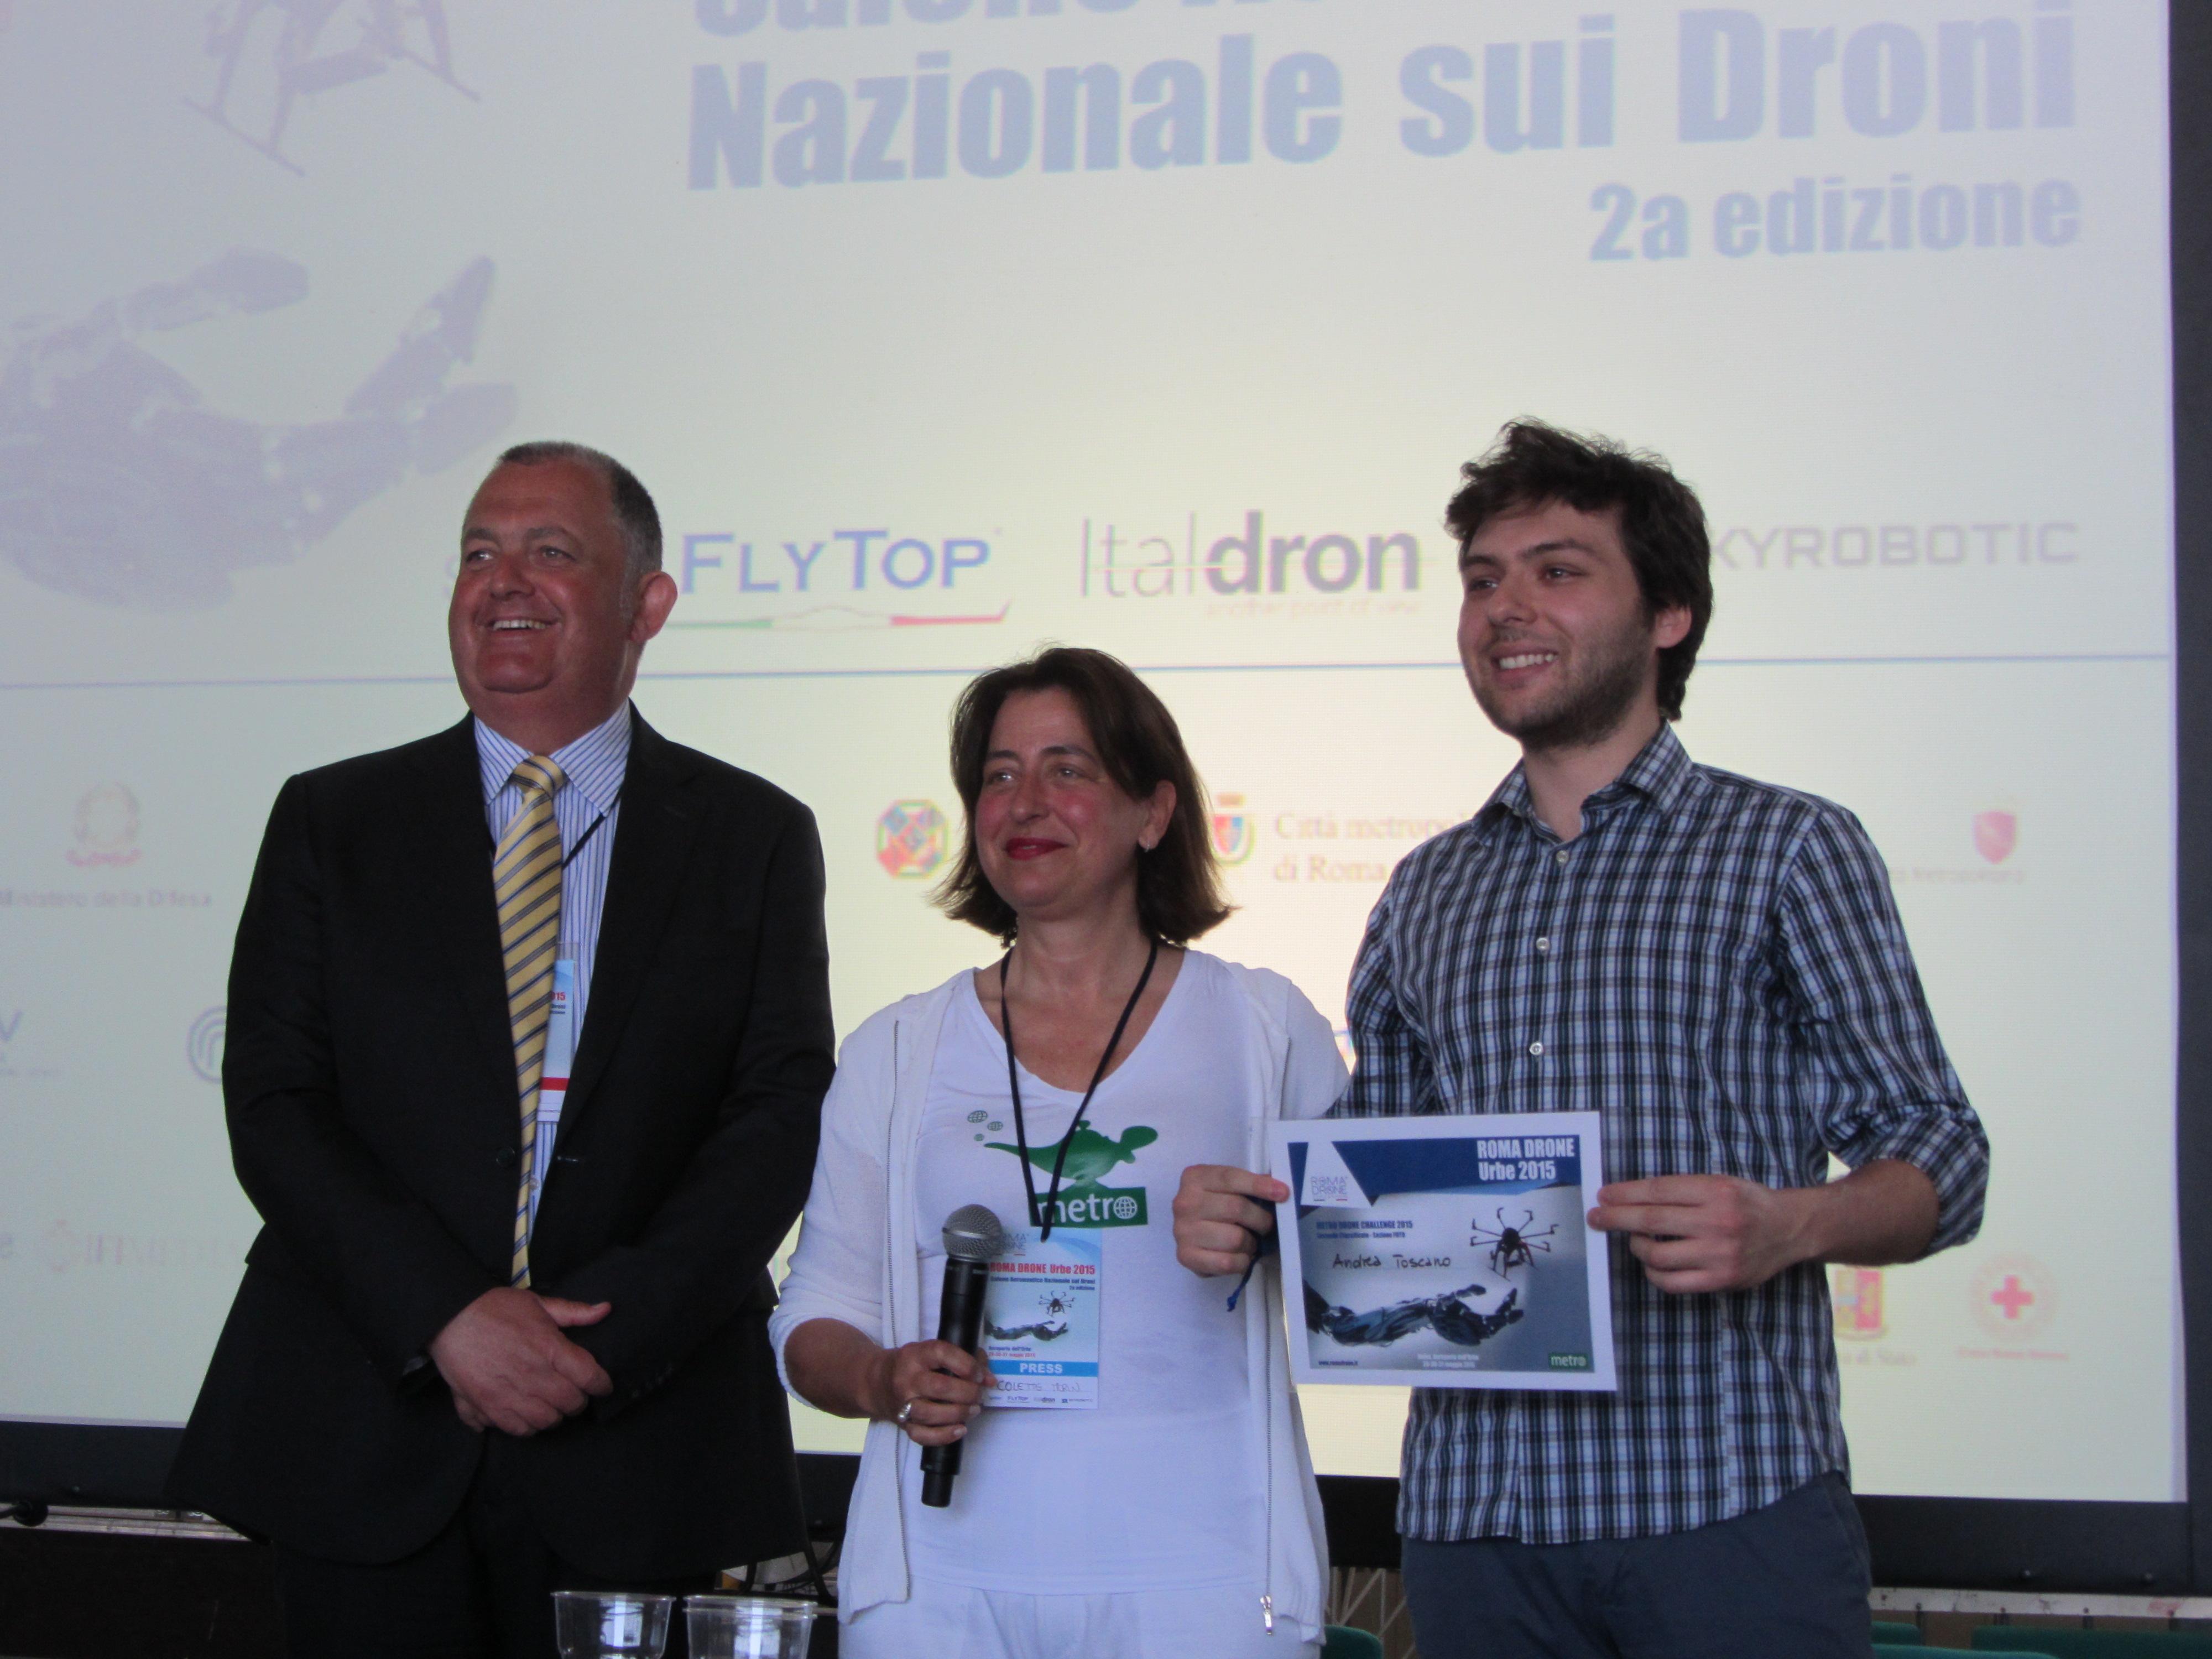 Metro Drone Challenge - Andrea Toscano - Award Ceremony (Rome Drone Expo 2015)